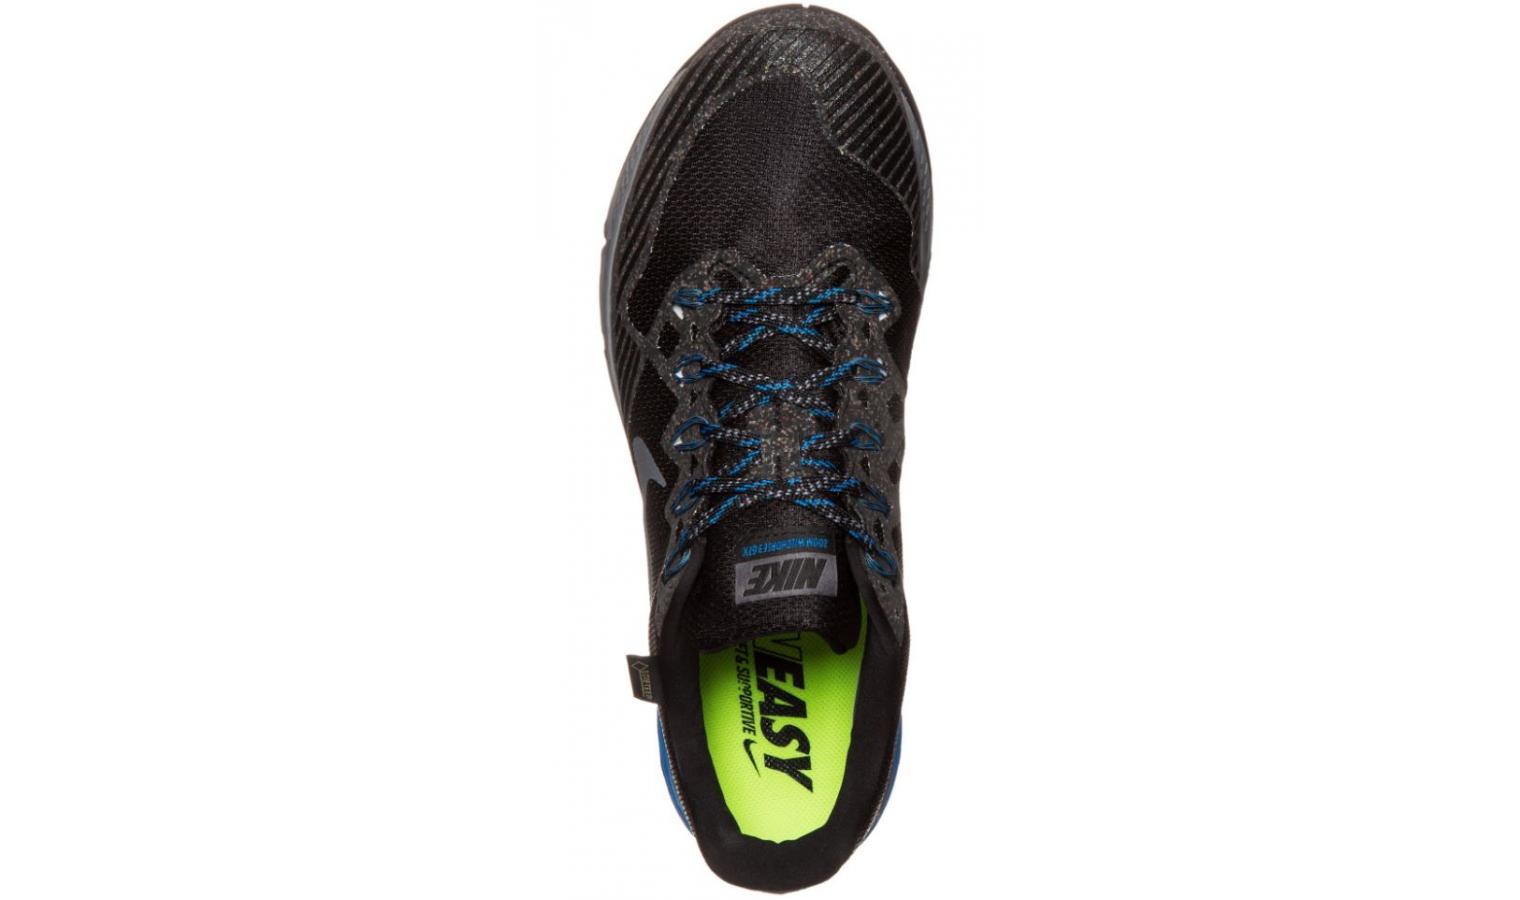 e09827dea46d ... Pánske bežecké tenisky Nike ZOOM WILDHORSE 3 GTX čierne. 0 EUR